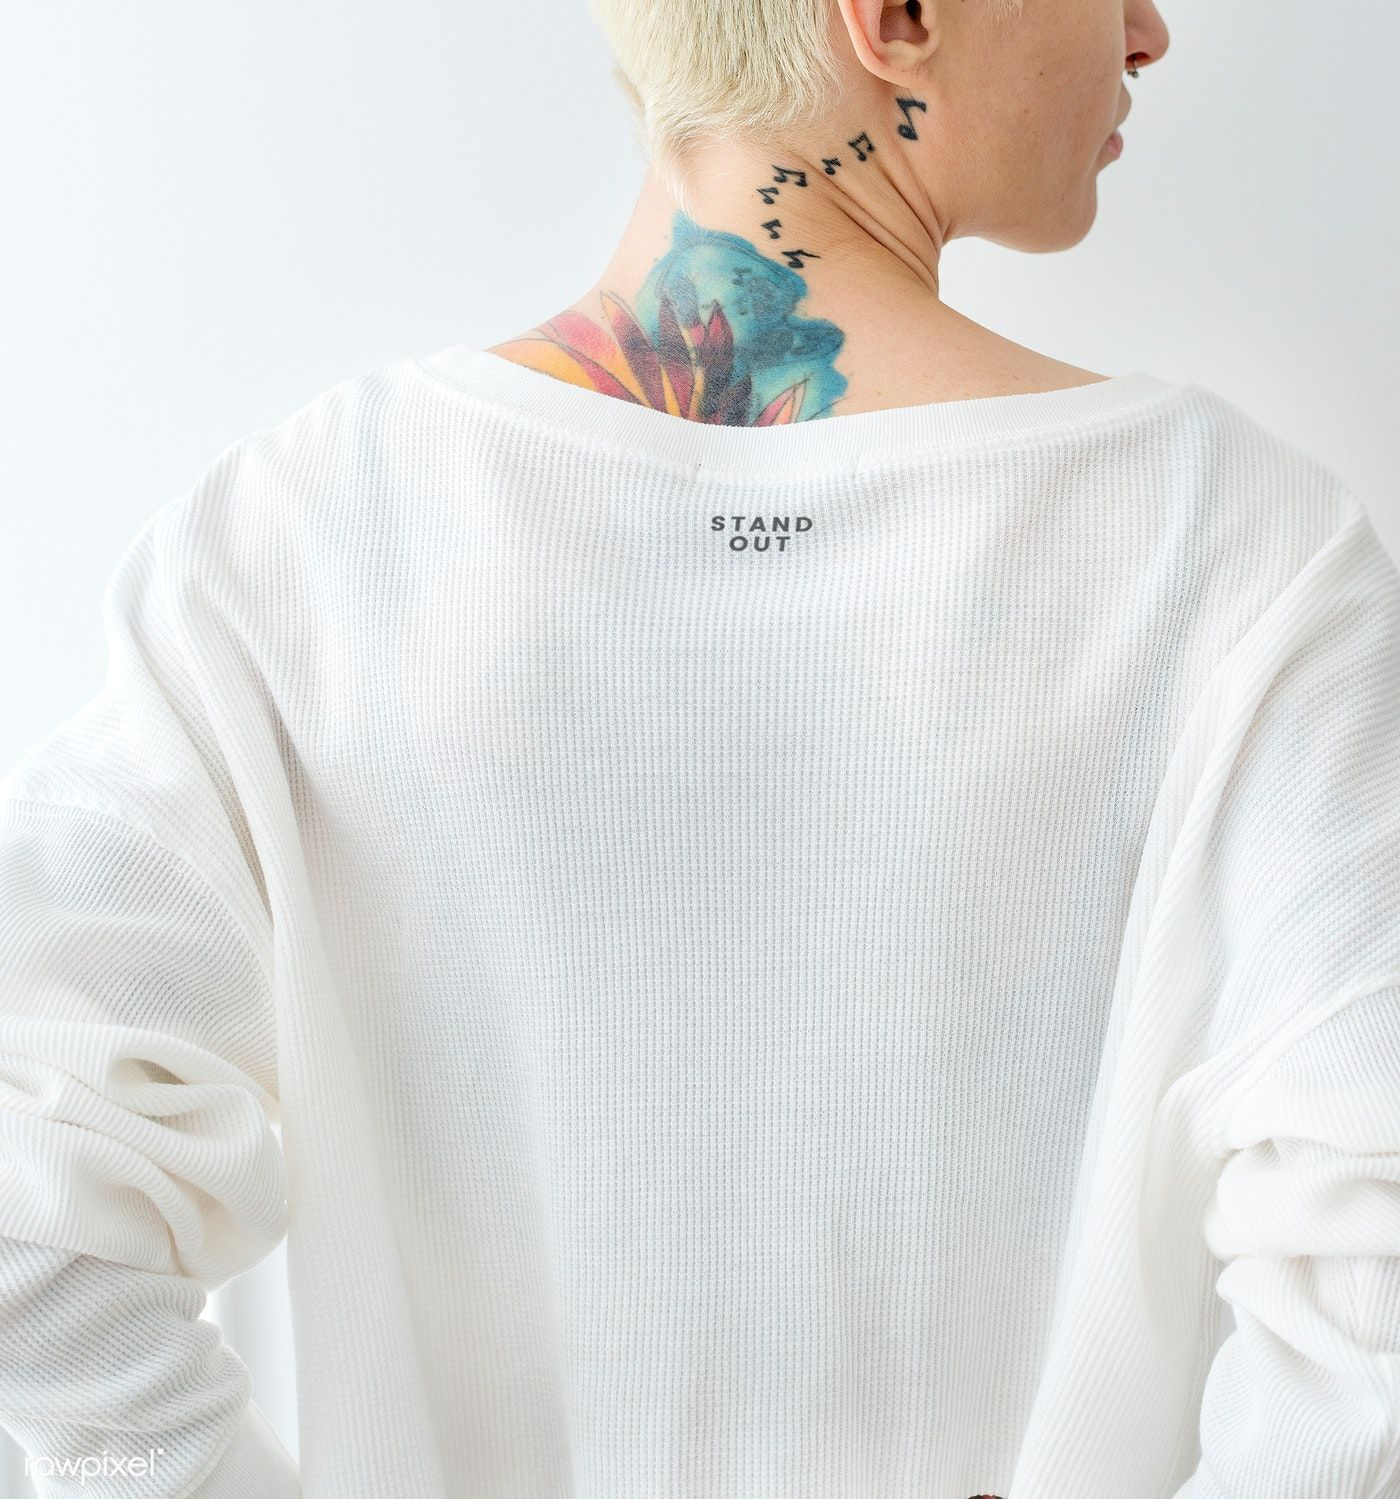 Download Download Premium Psd Of Tattooed Woman Wearing A White T Shirt Mockup Shirt Mockup Tshirt Mockup Design Mockup Free